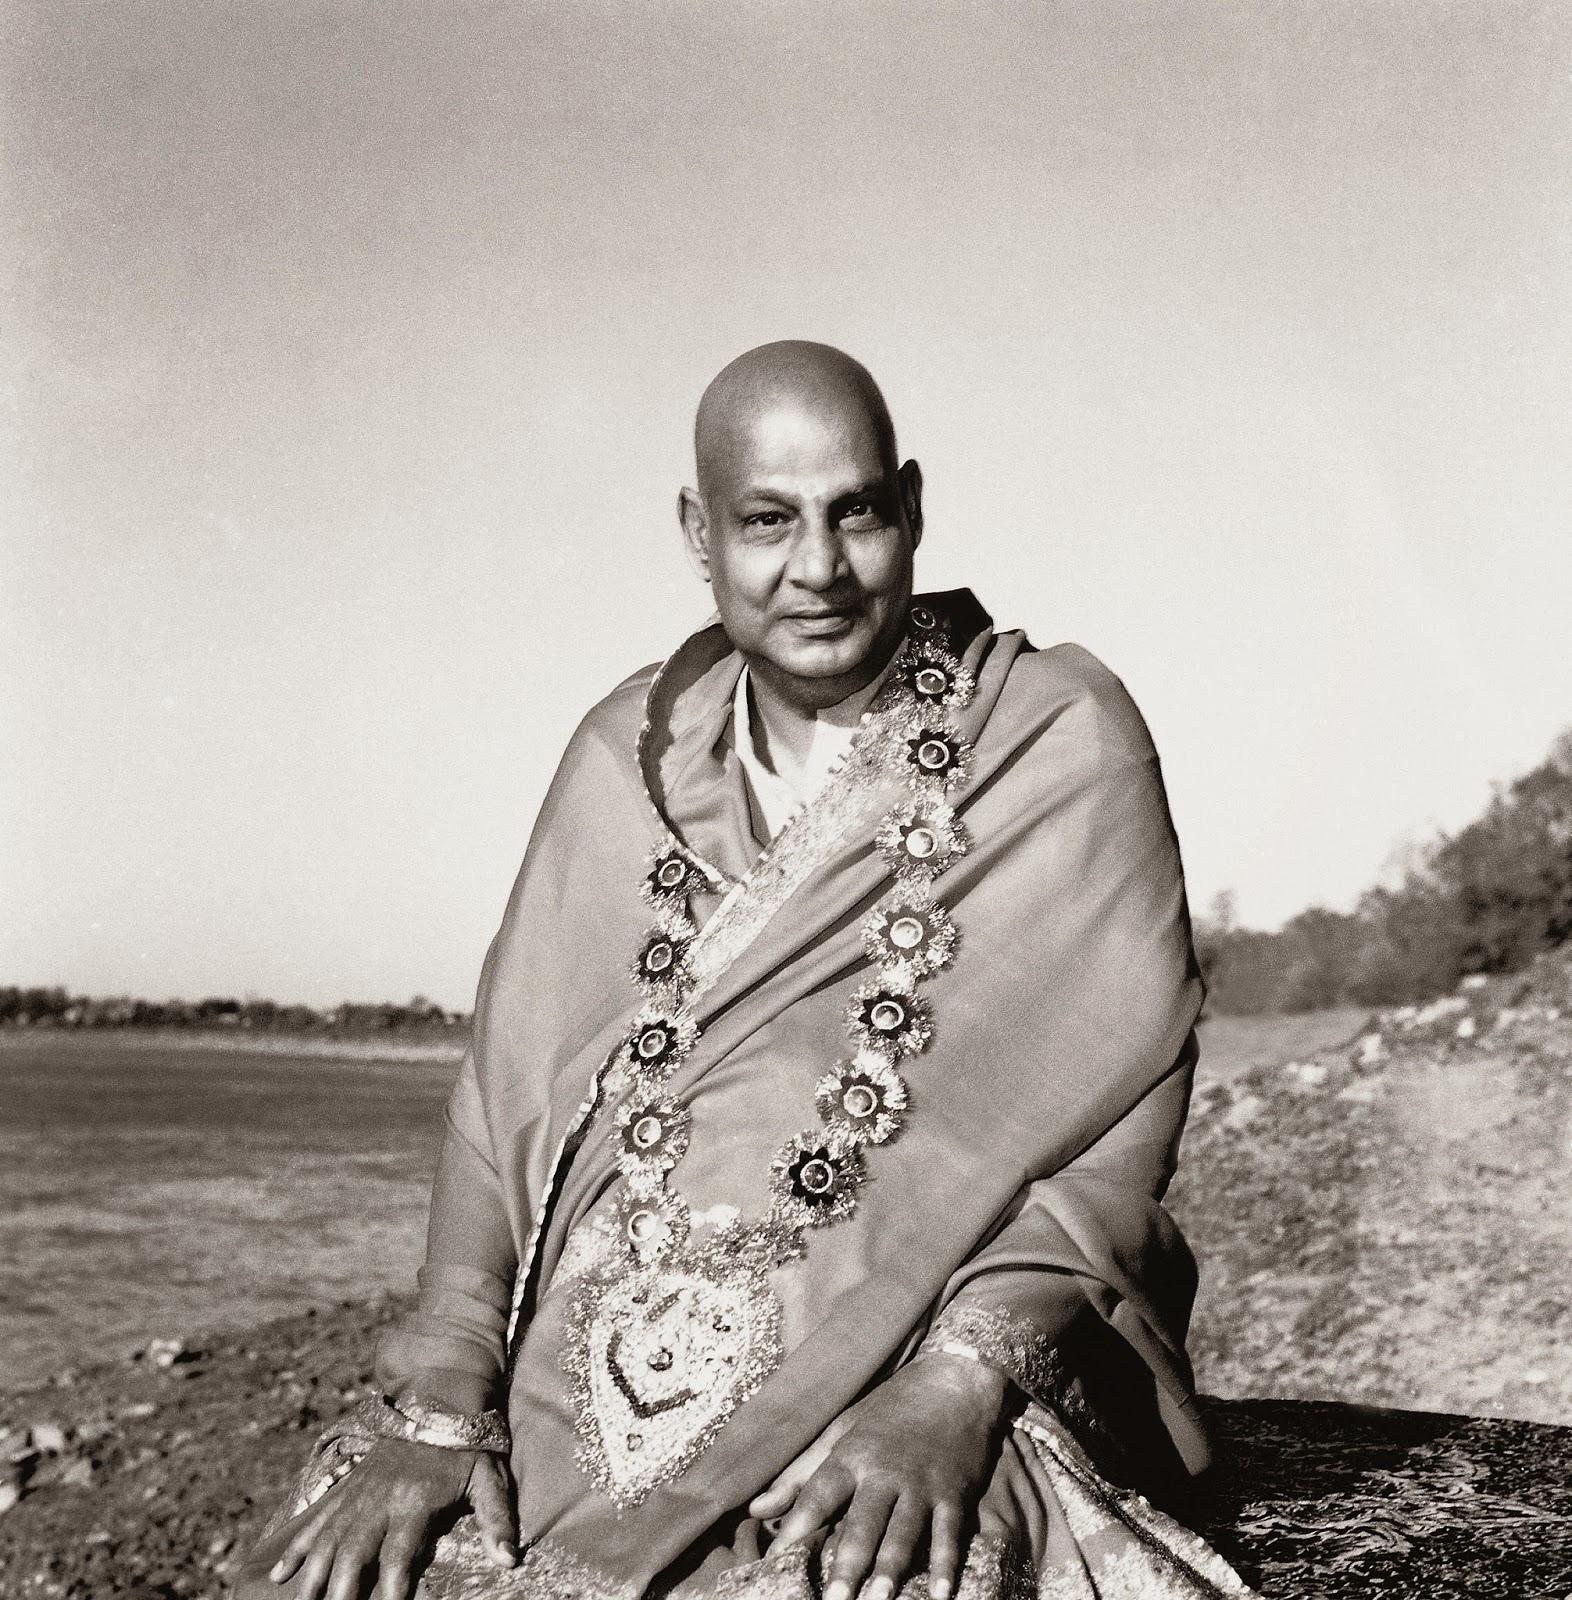 Conciencia Yoga  El yoga según Sri Swami Sivananda 344b1e22a325